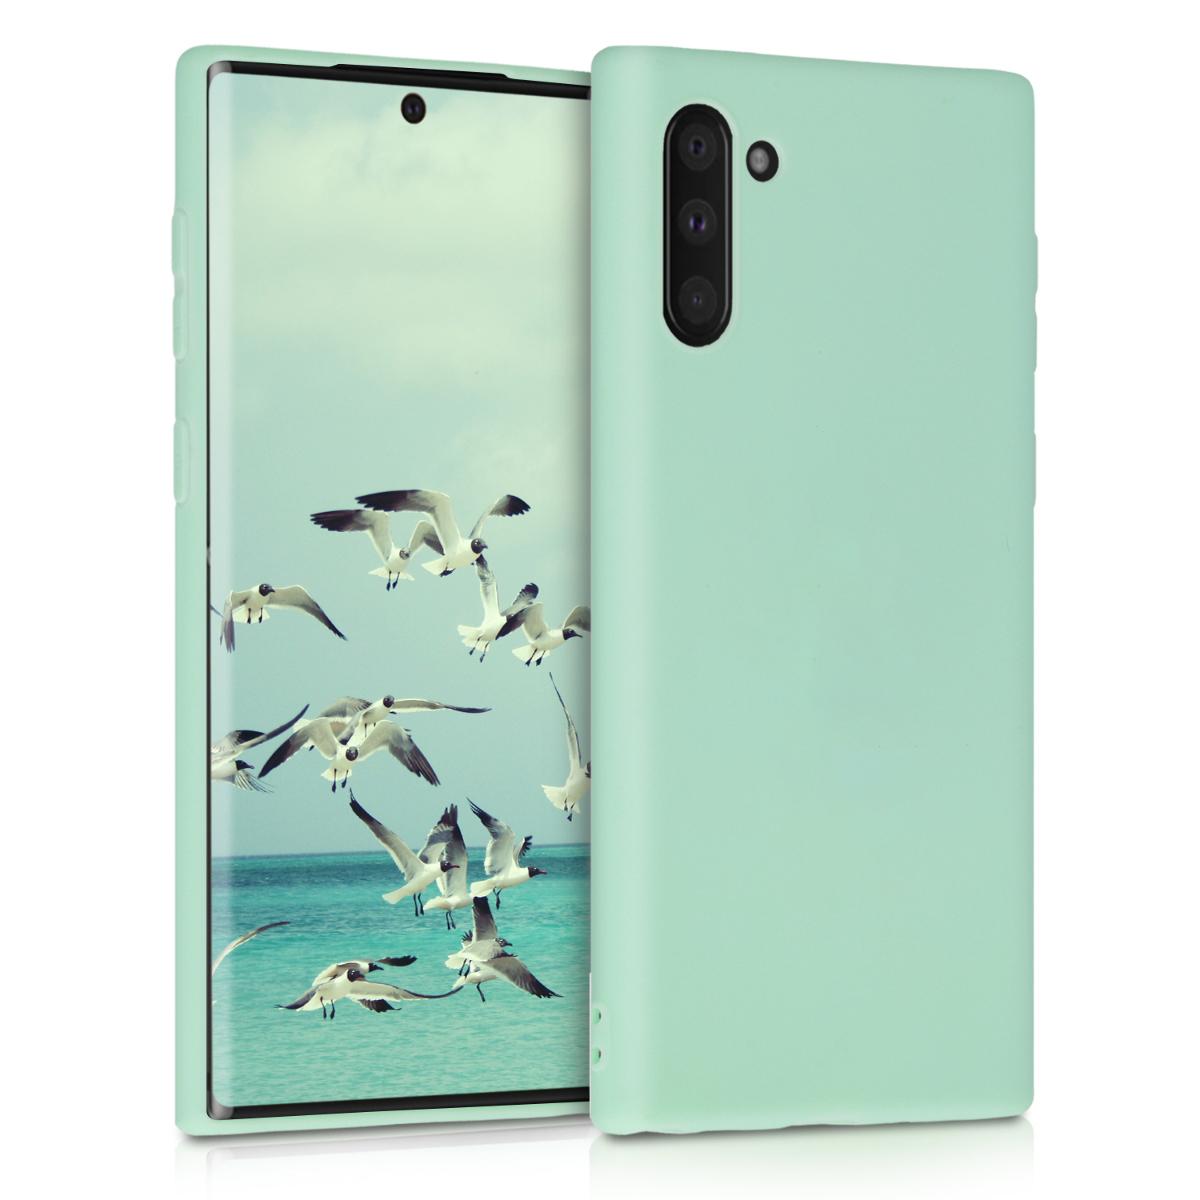 KW Θήκη Σιλικόνης Samsung Galaxy Note 10 - Mint Matte (49274.50)